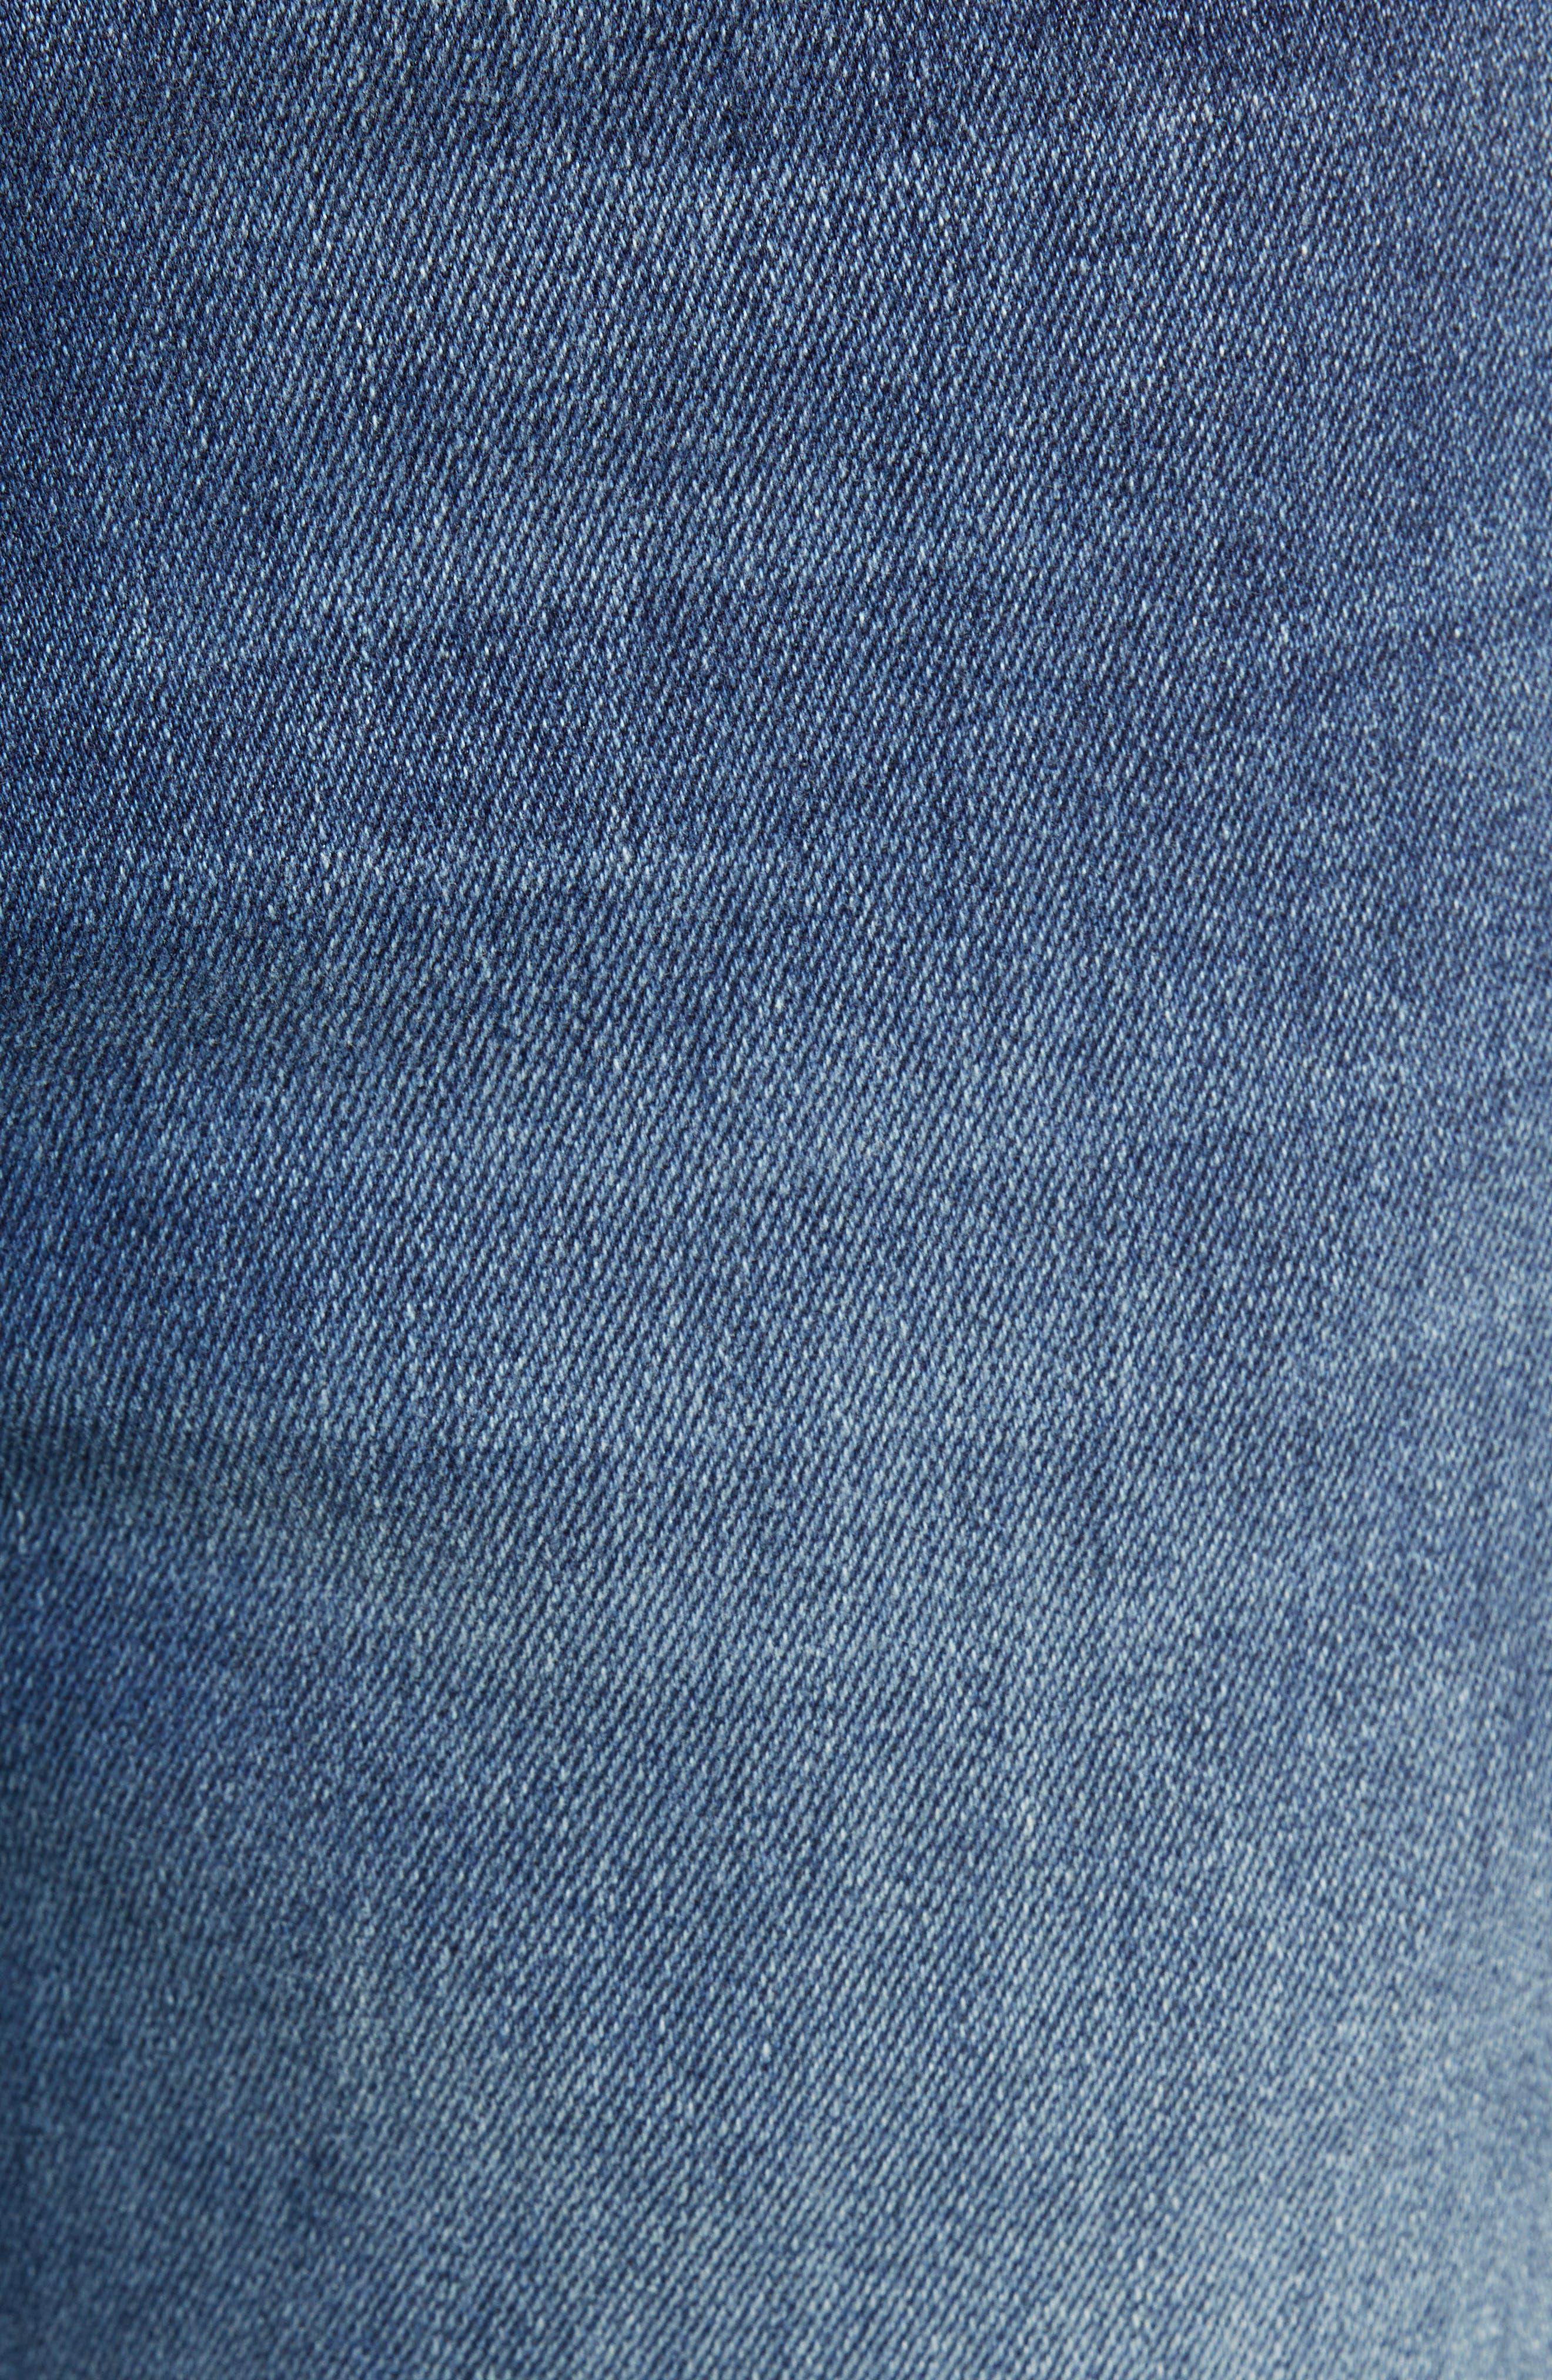 Torino Slim Fit Jeans,                             Alternate thumbnail 5, color,                             EMPIRE BLUE